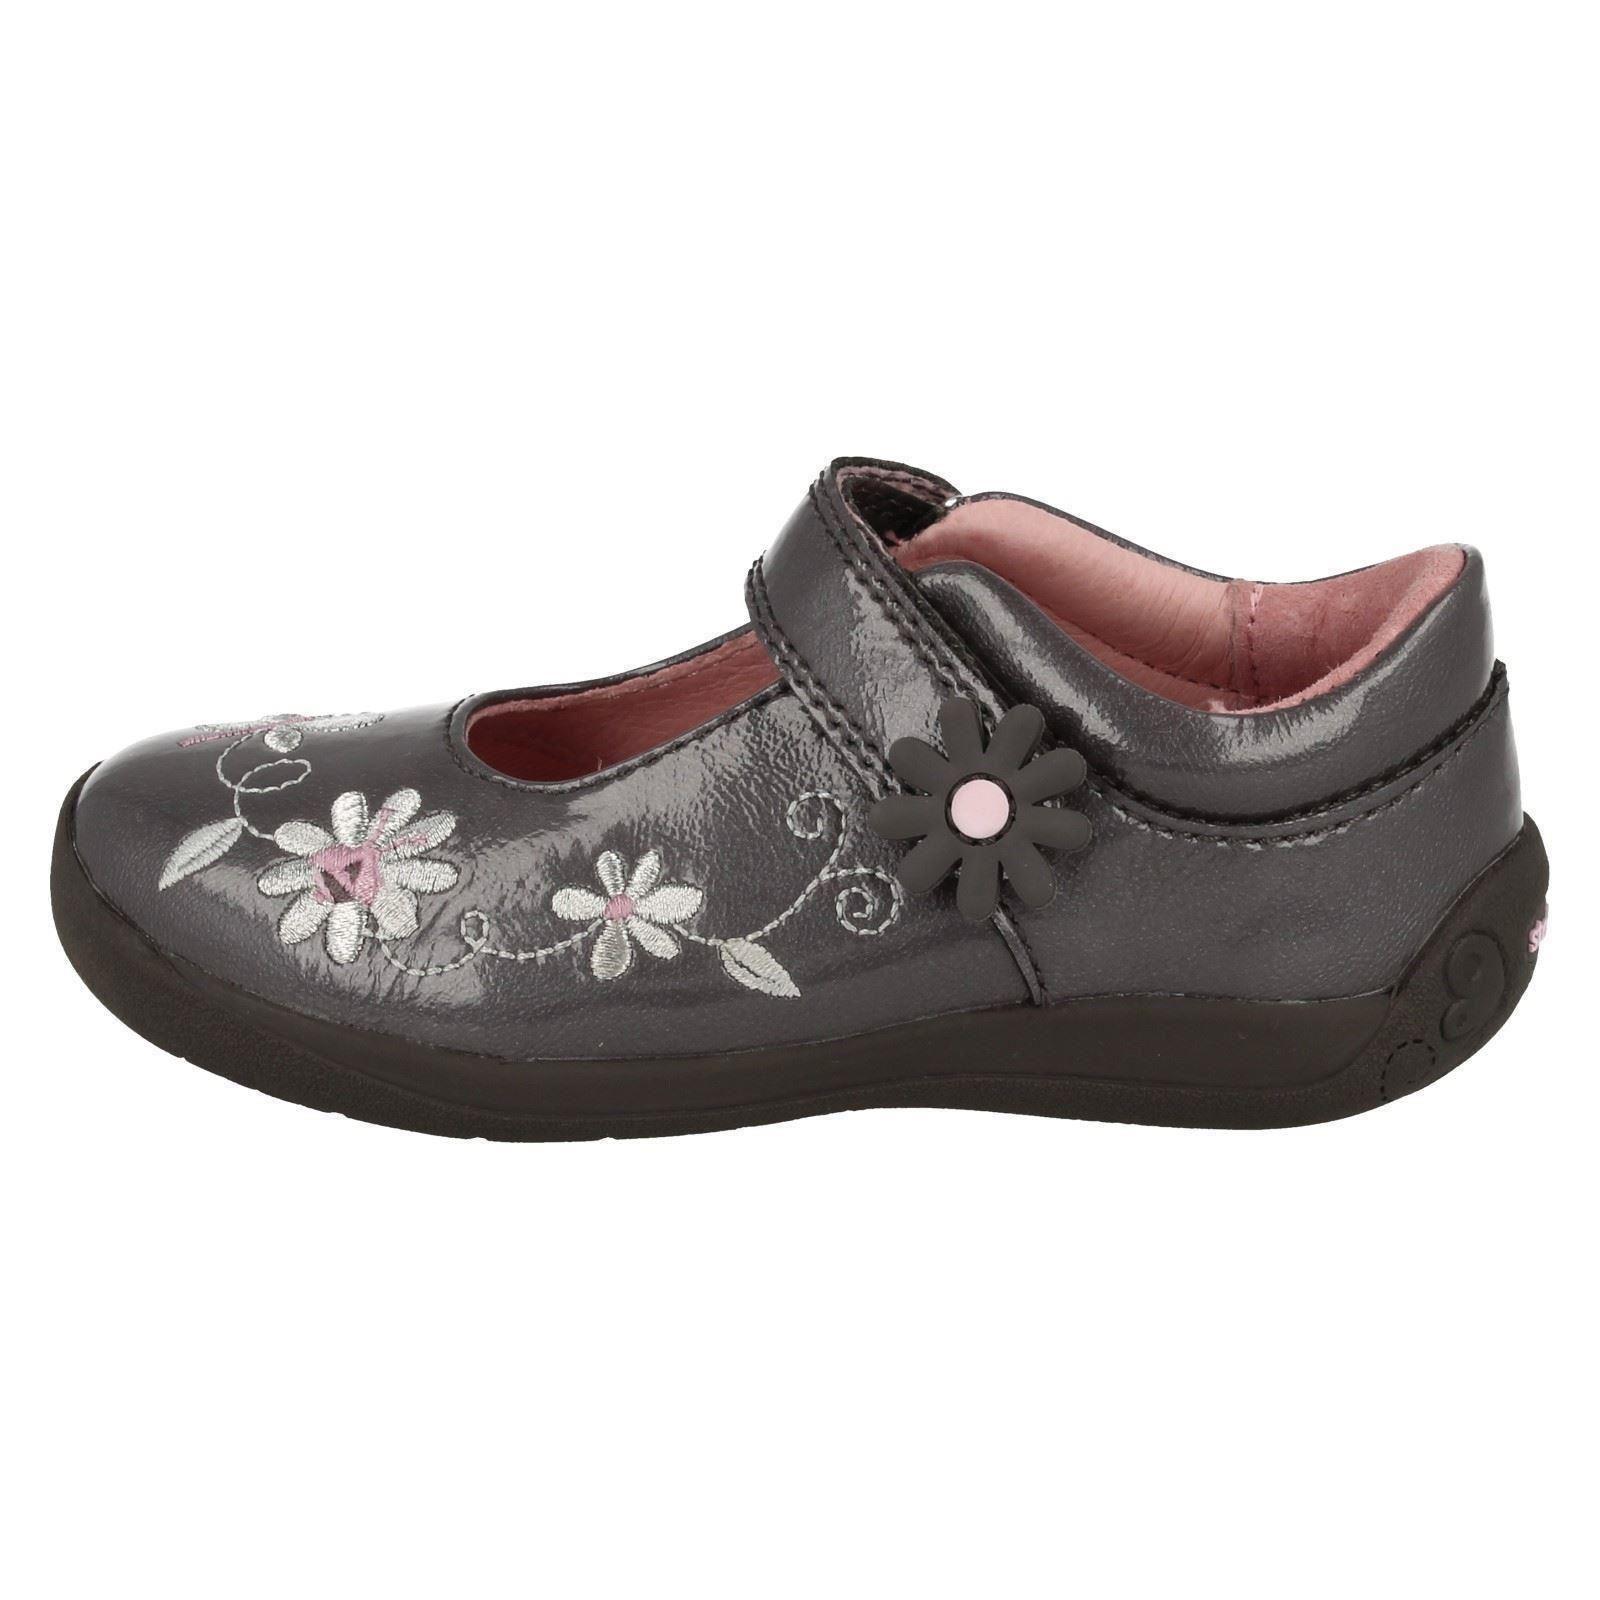 Infant Girls Startrite Flat Shoes Super Soft Honey Bee